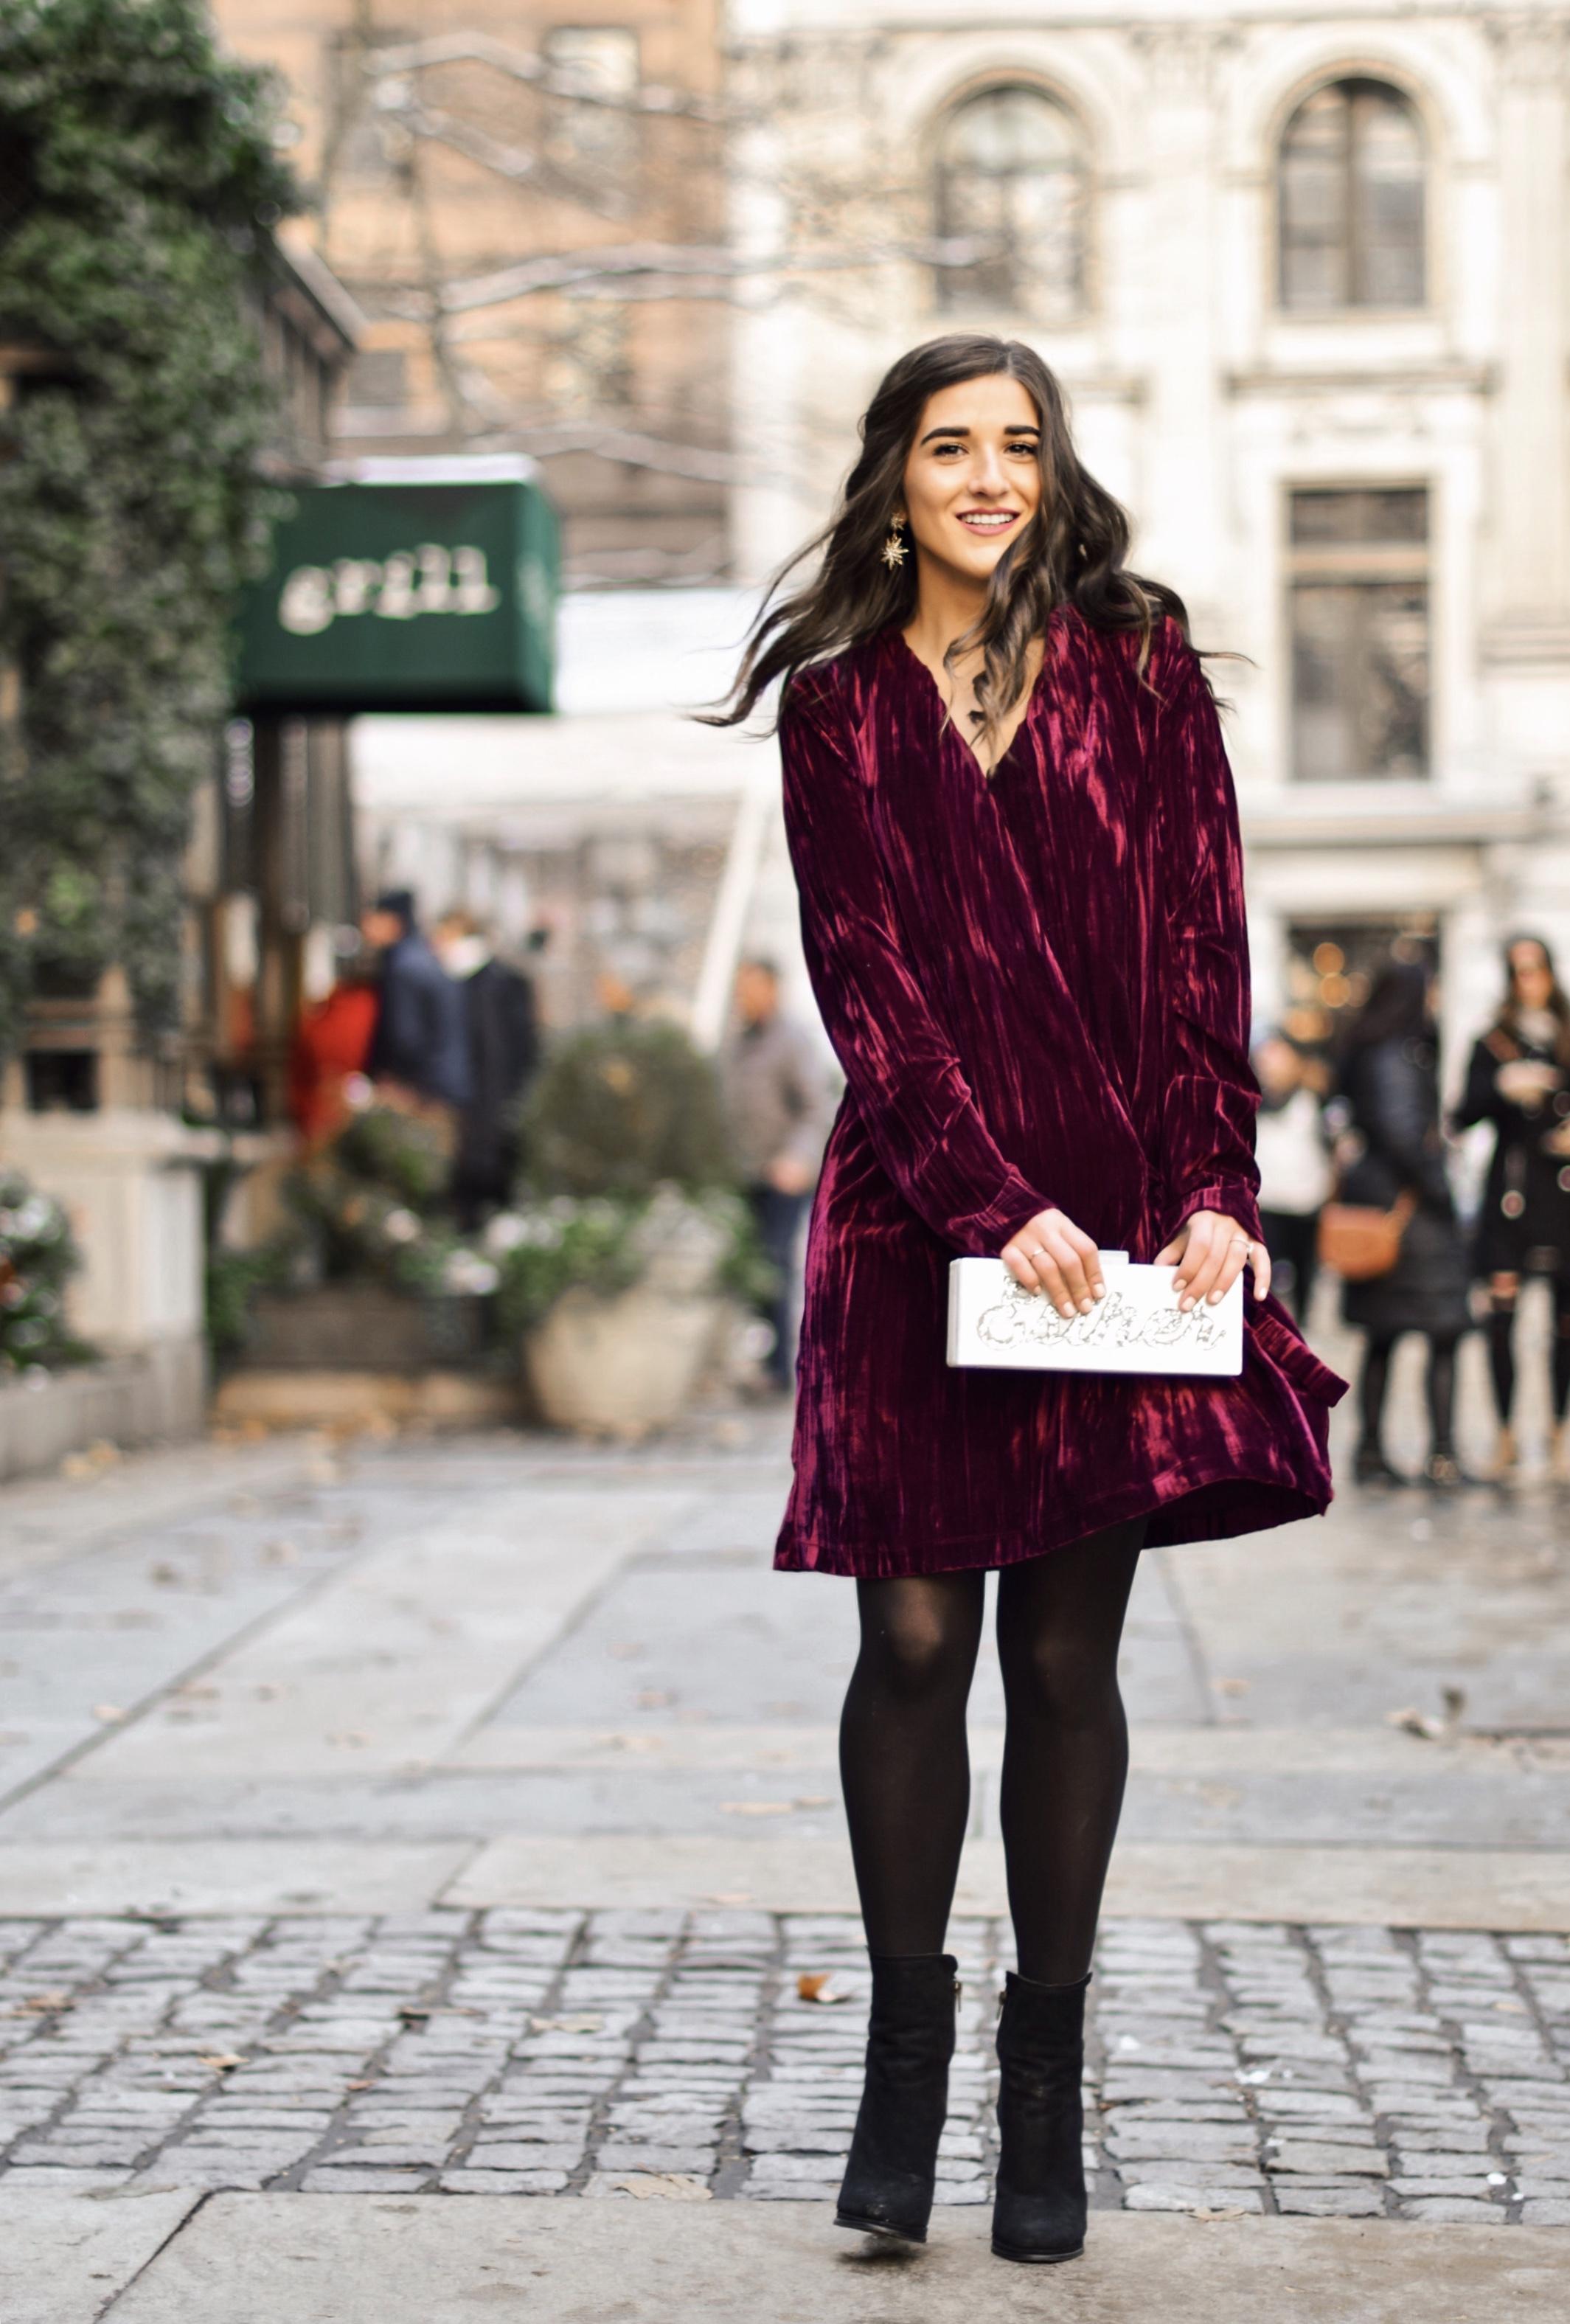 ae66b7910dcb 17 Tips On Building An Instagram Following Maroon Velvet Dress Black  Booties Esther Santer Fashion Blog